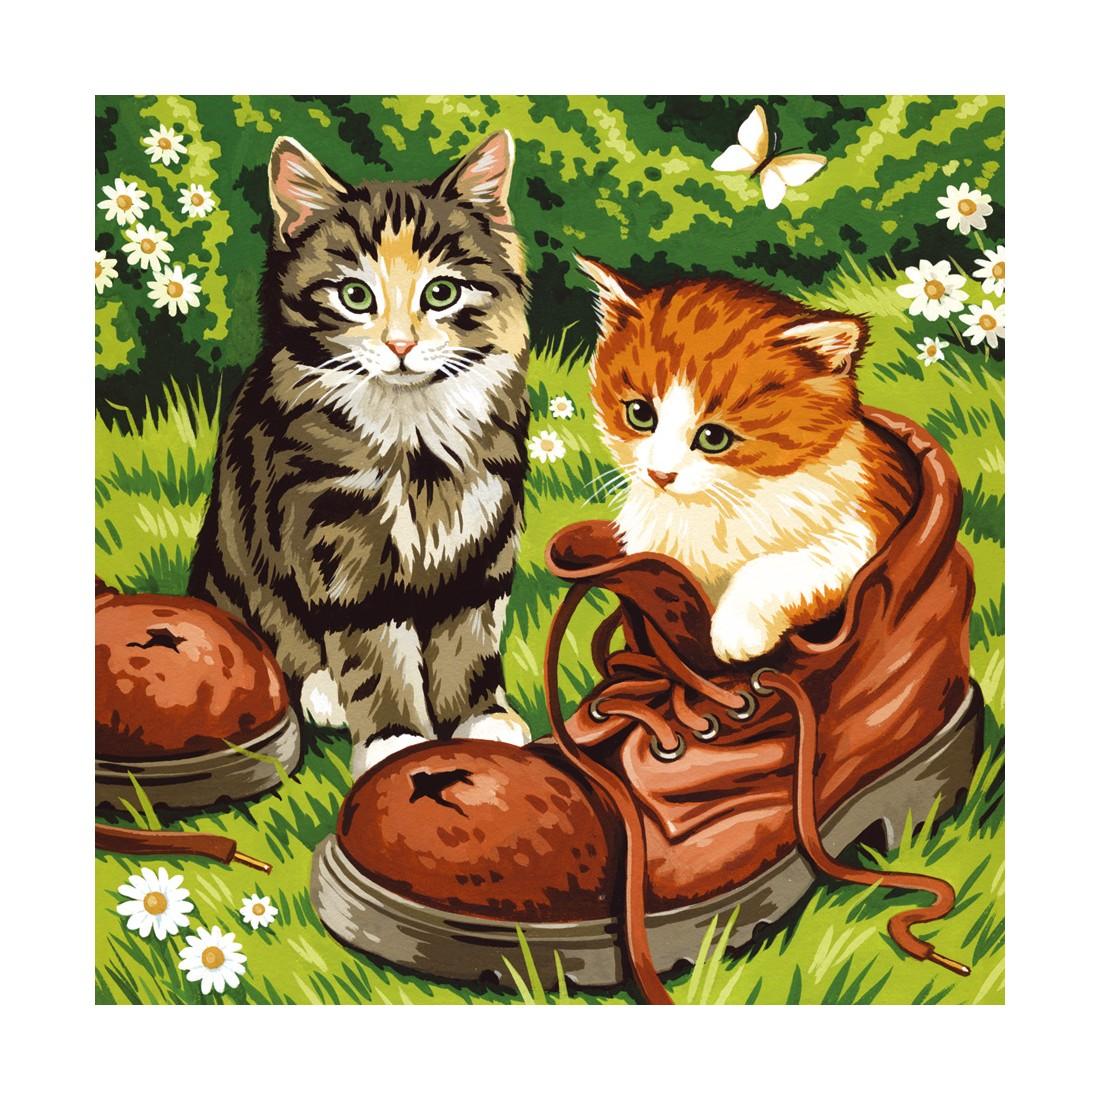 Fein Süße Katze Druckbare Malvorlagen Bilder - Entry Level Resume ...